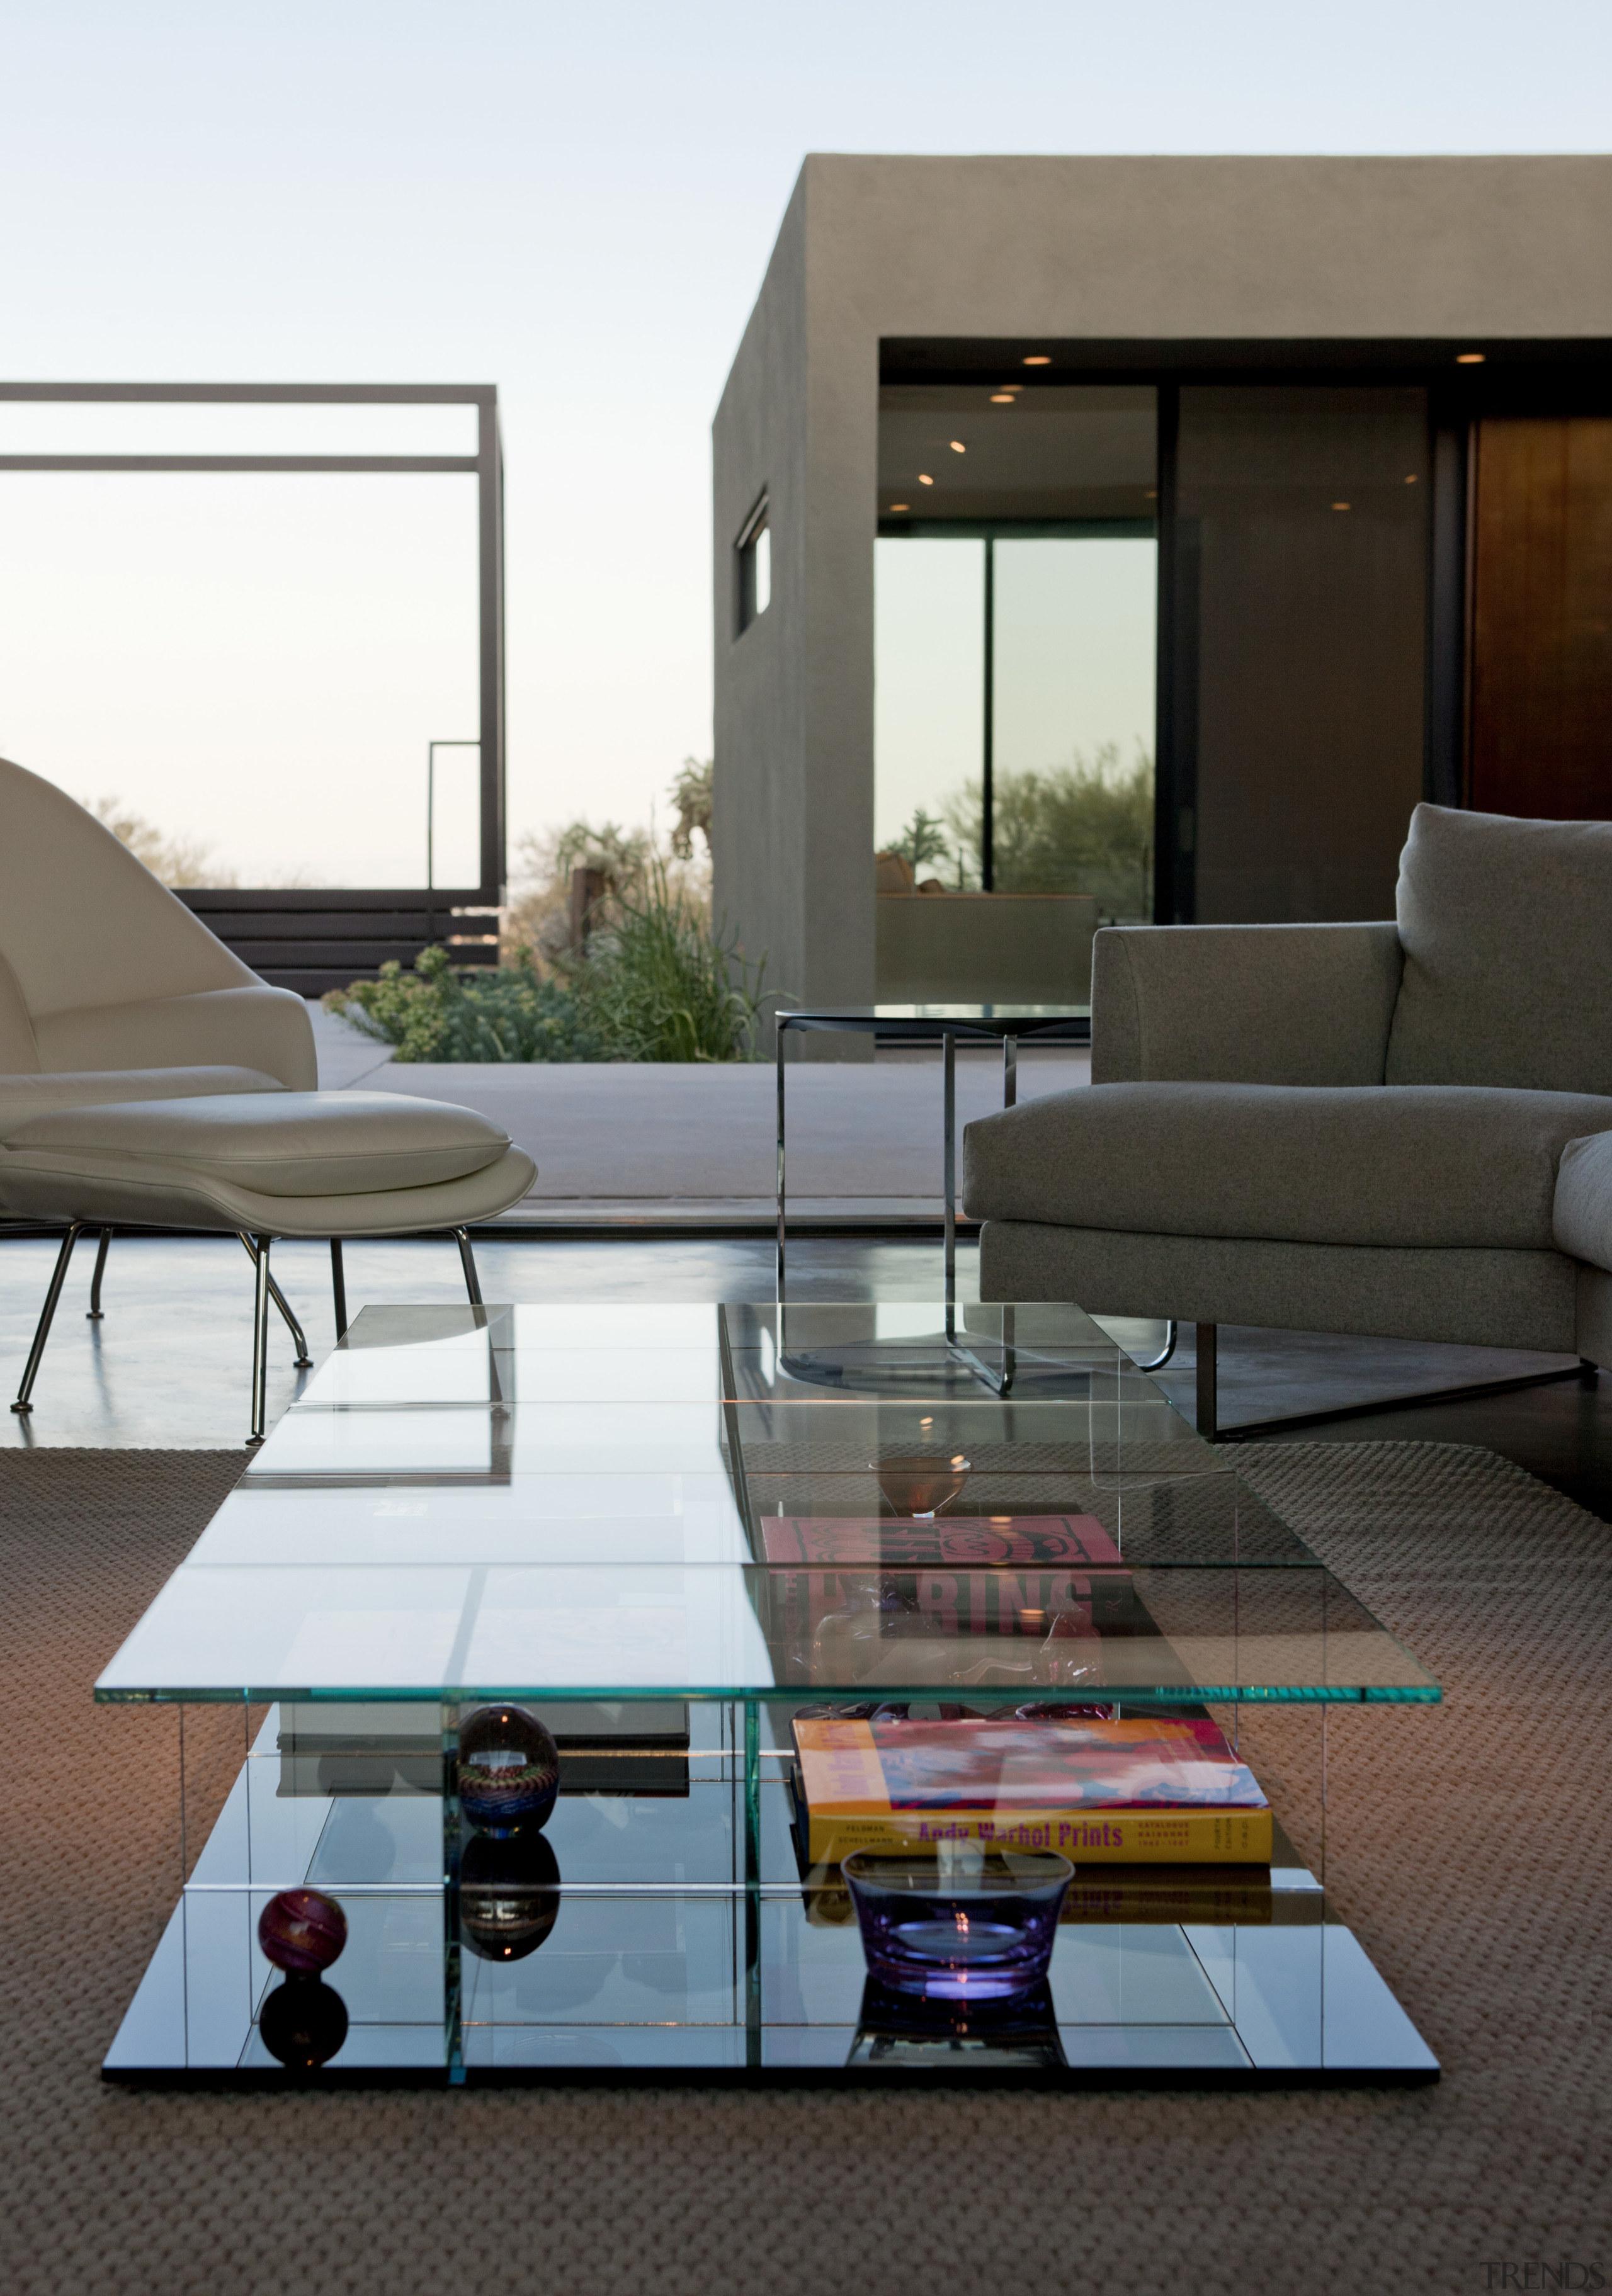 Minimalist desert new house - Gallery - 23 | Trends